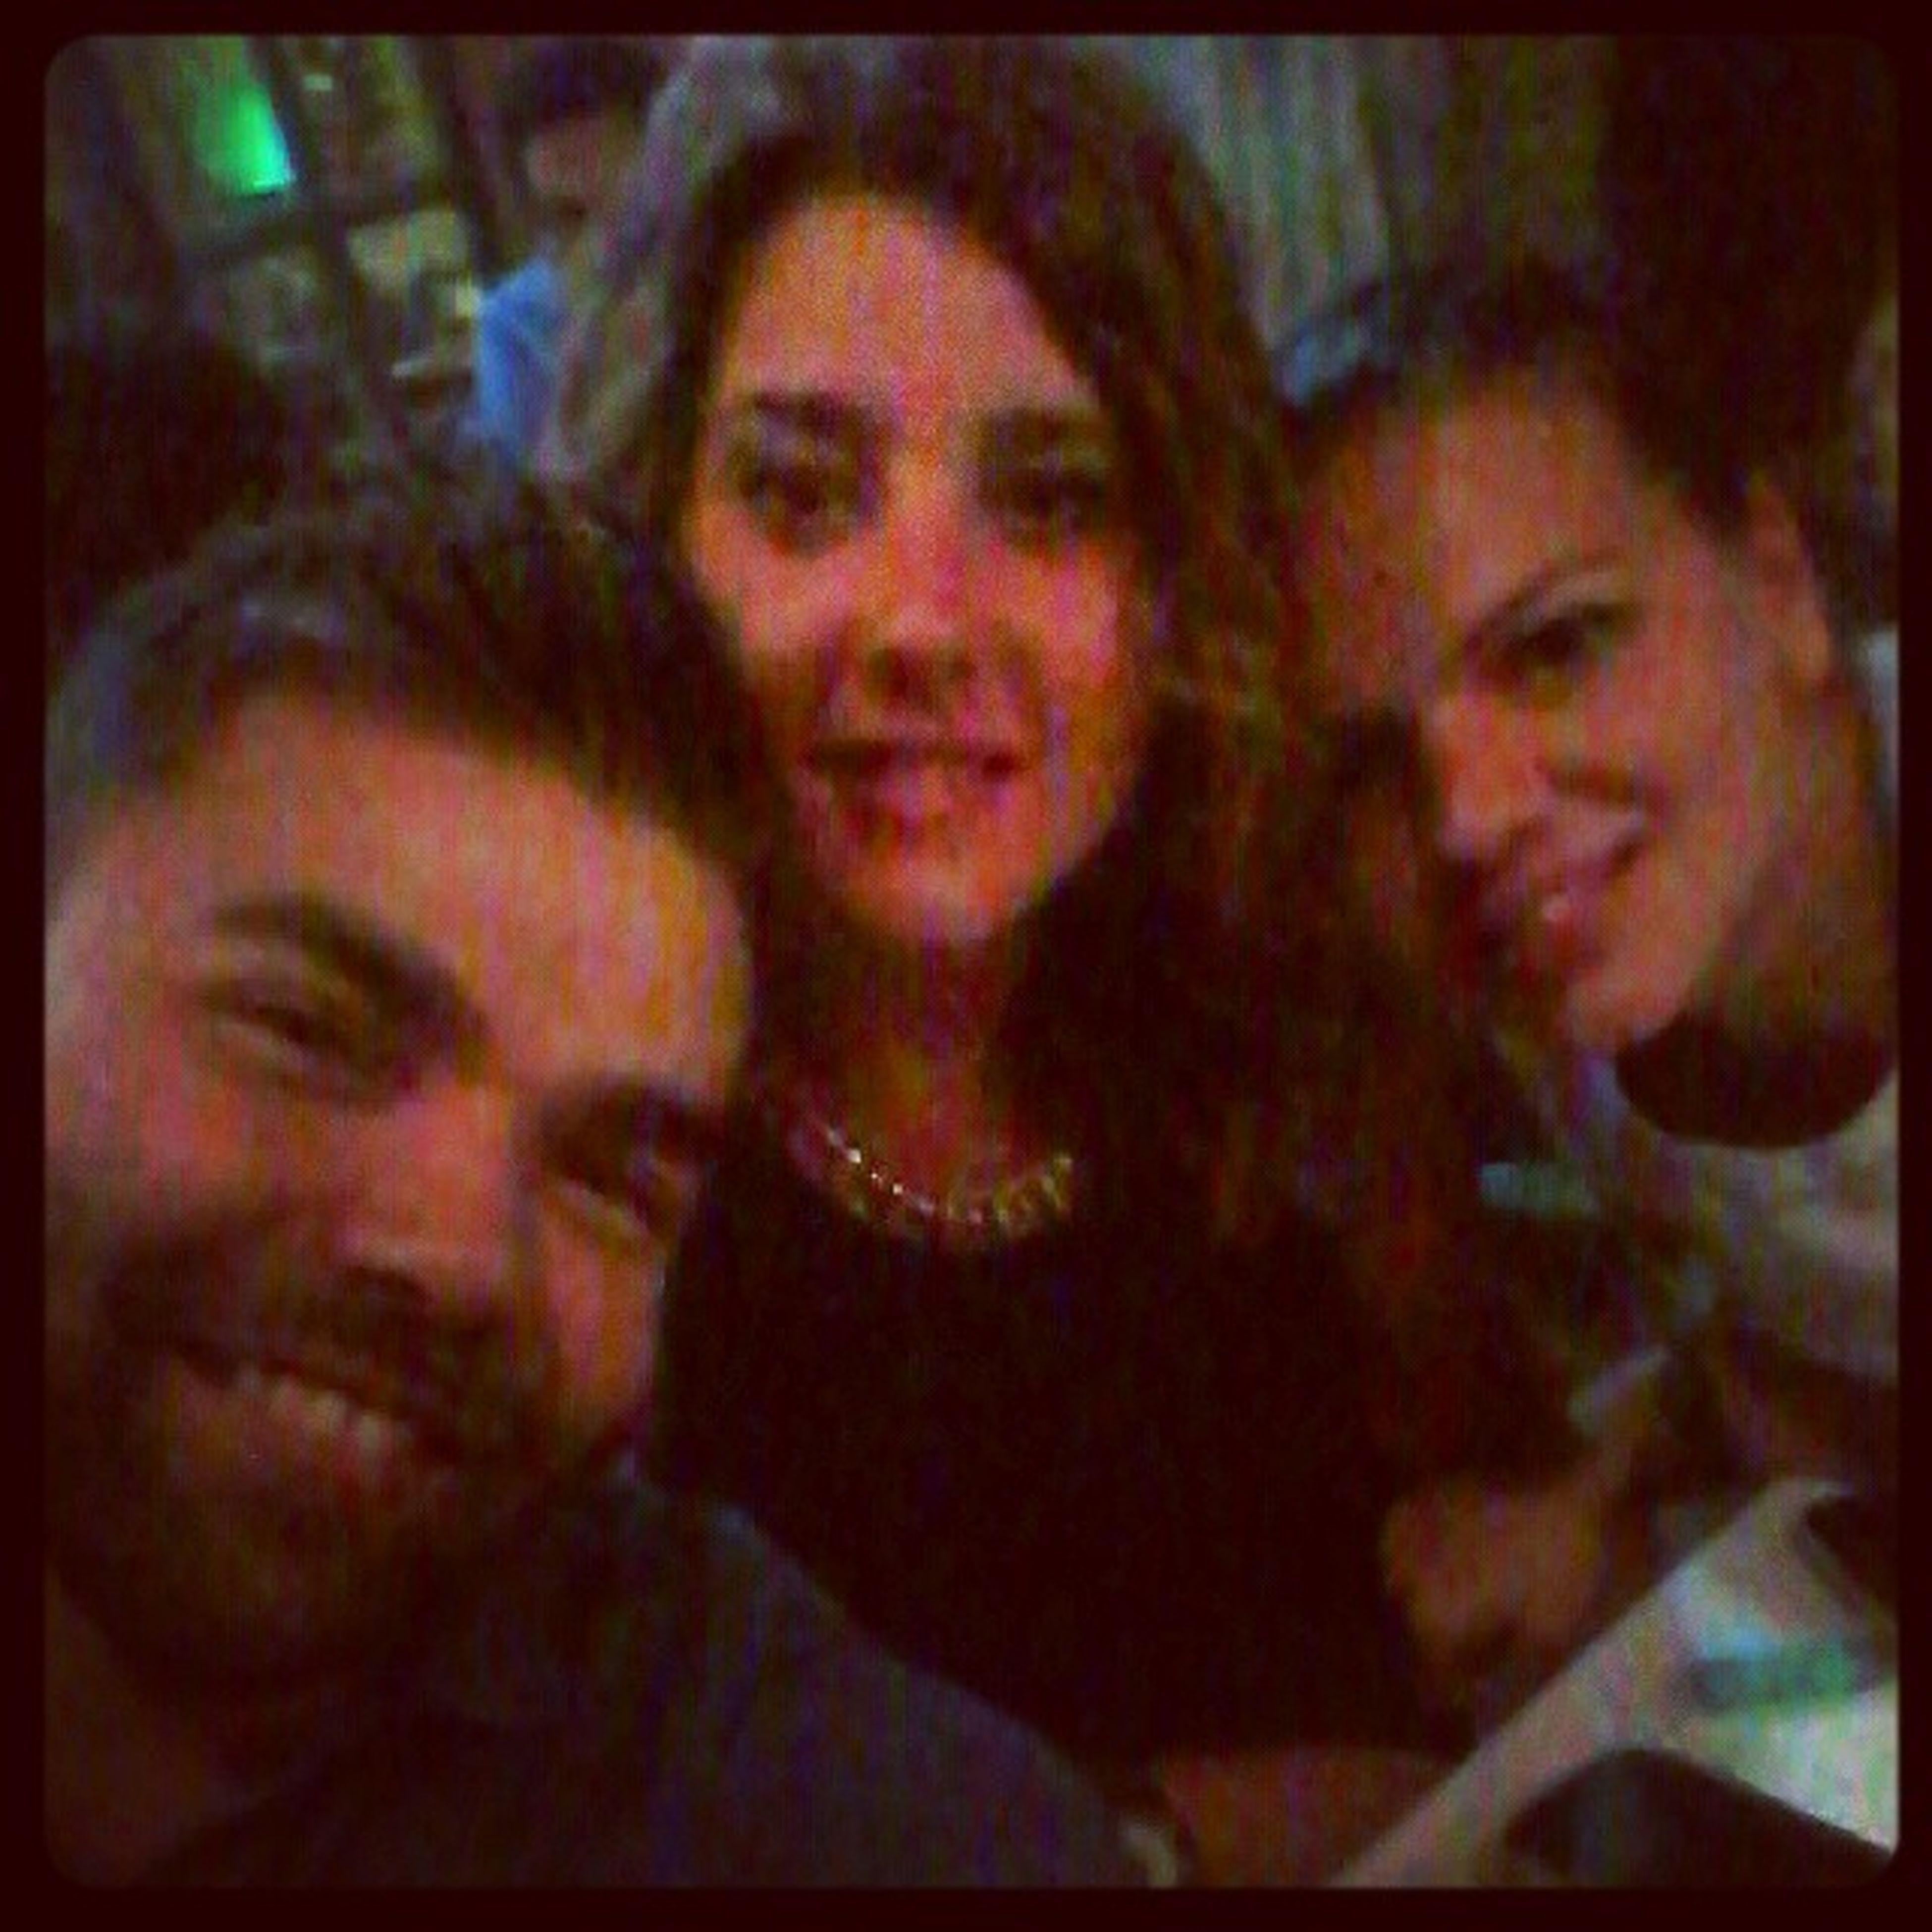 Pezodromos Hfaistou Friday Night Friends Patras